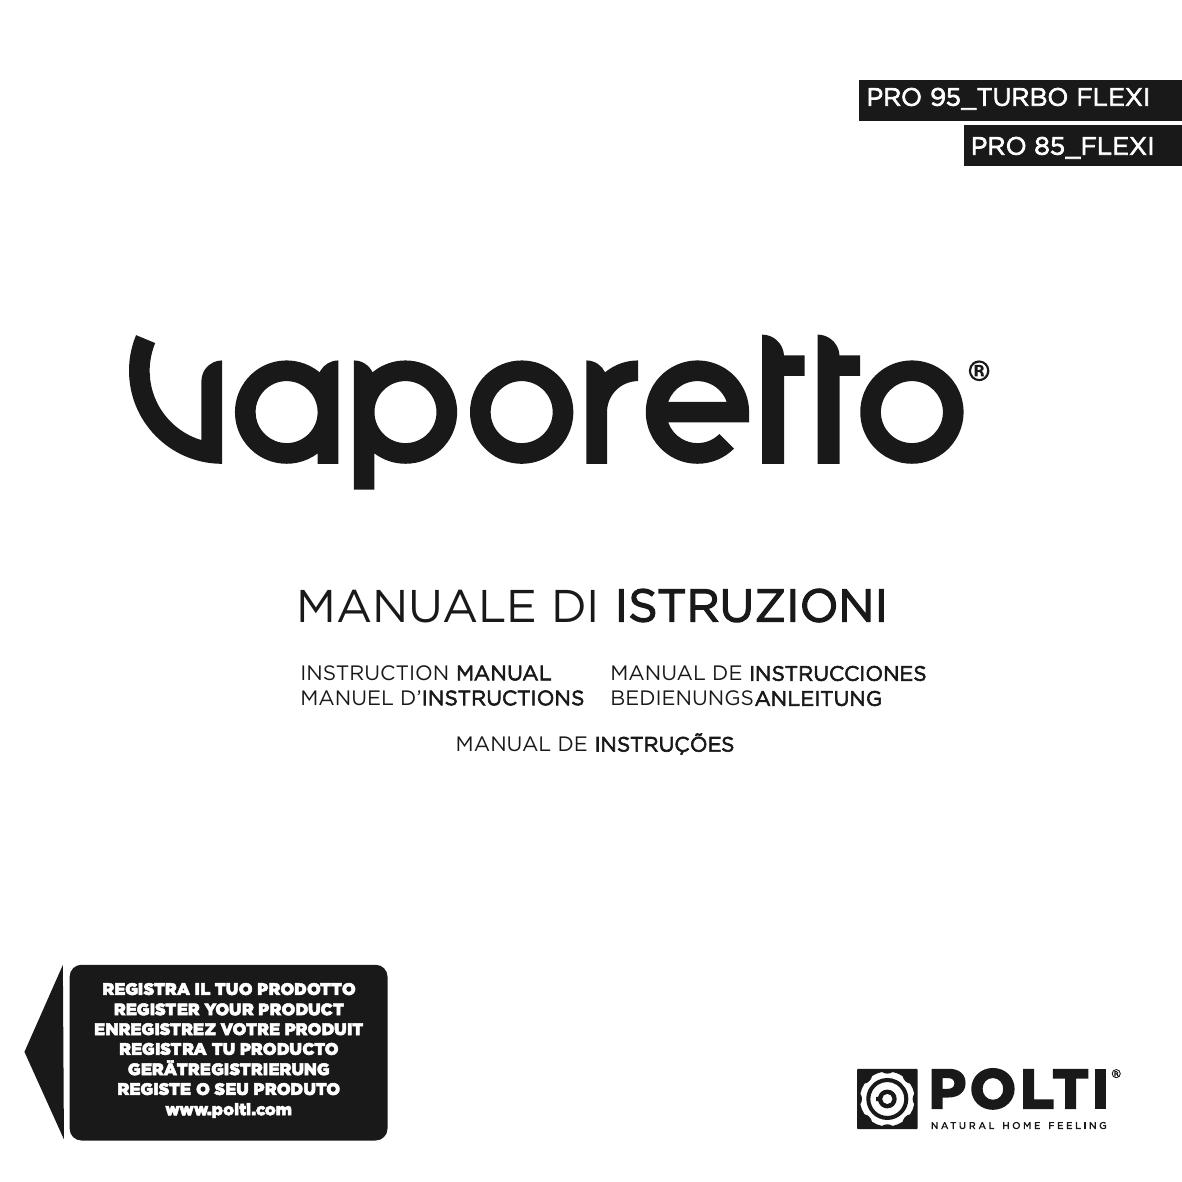 Setole in Ottone /& Kalstop PAEU0094 Anticalcare per Apparecchi a Caldaia Polti PAEU0297 Kit 3 Spazzolini